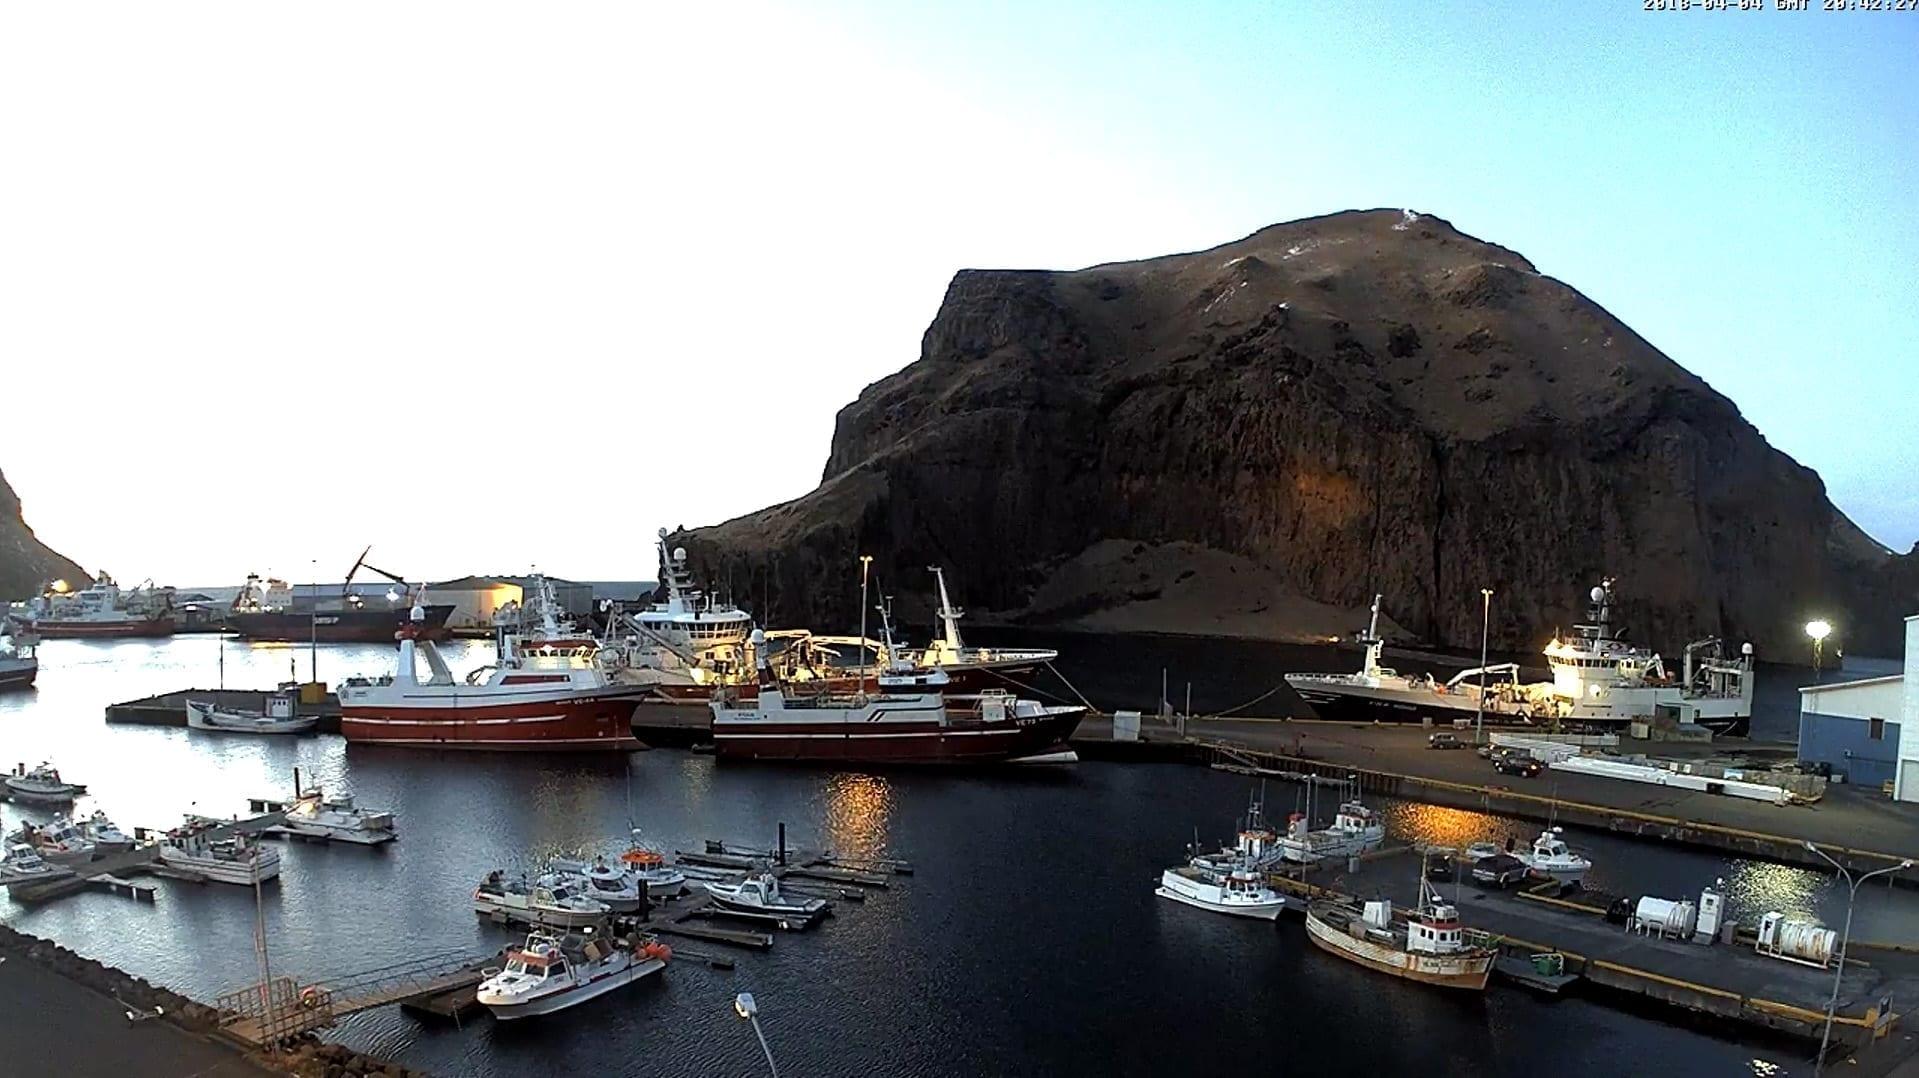 Live video from Westman Islands / Vestmannaeyjar boat tours